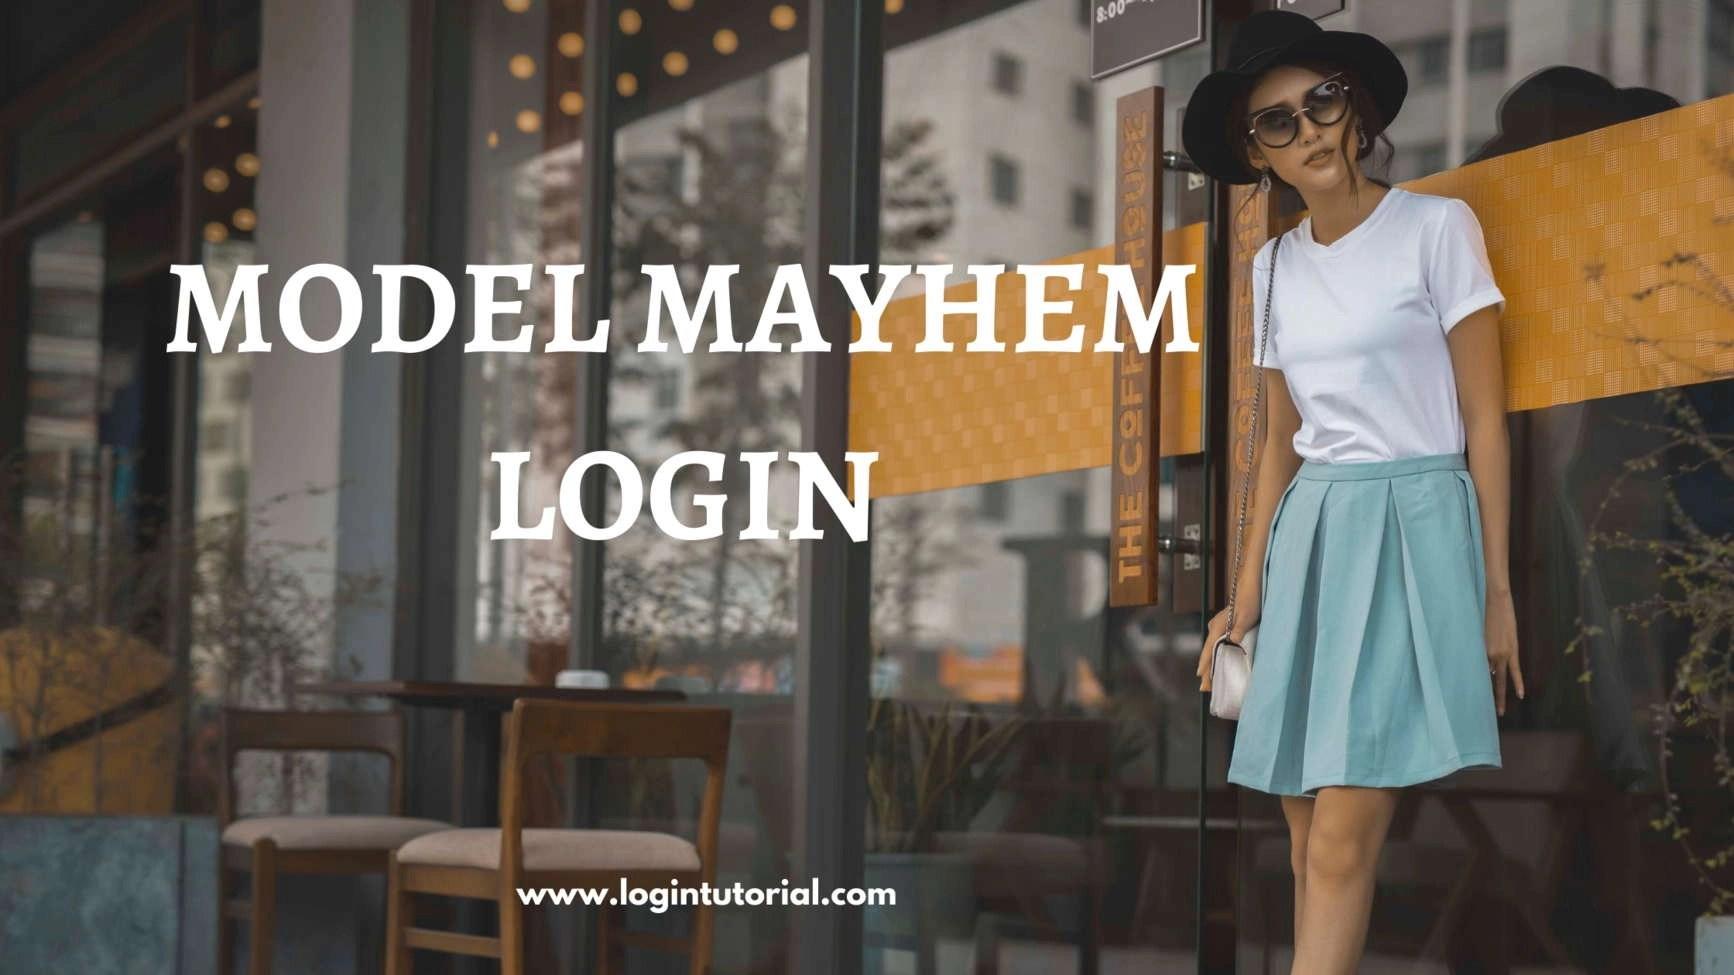 Model Mayhem Login Image